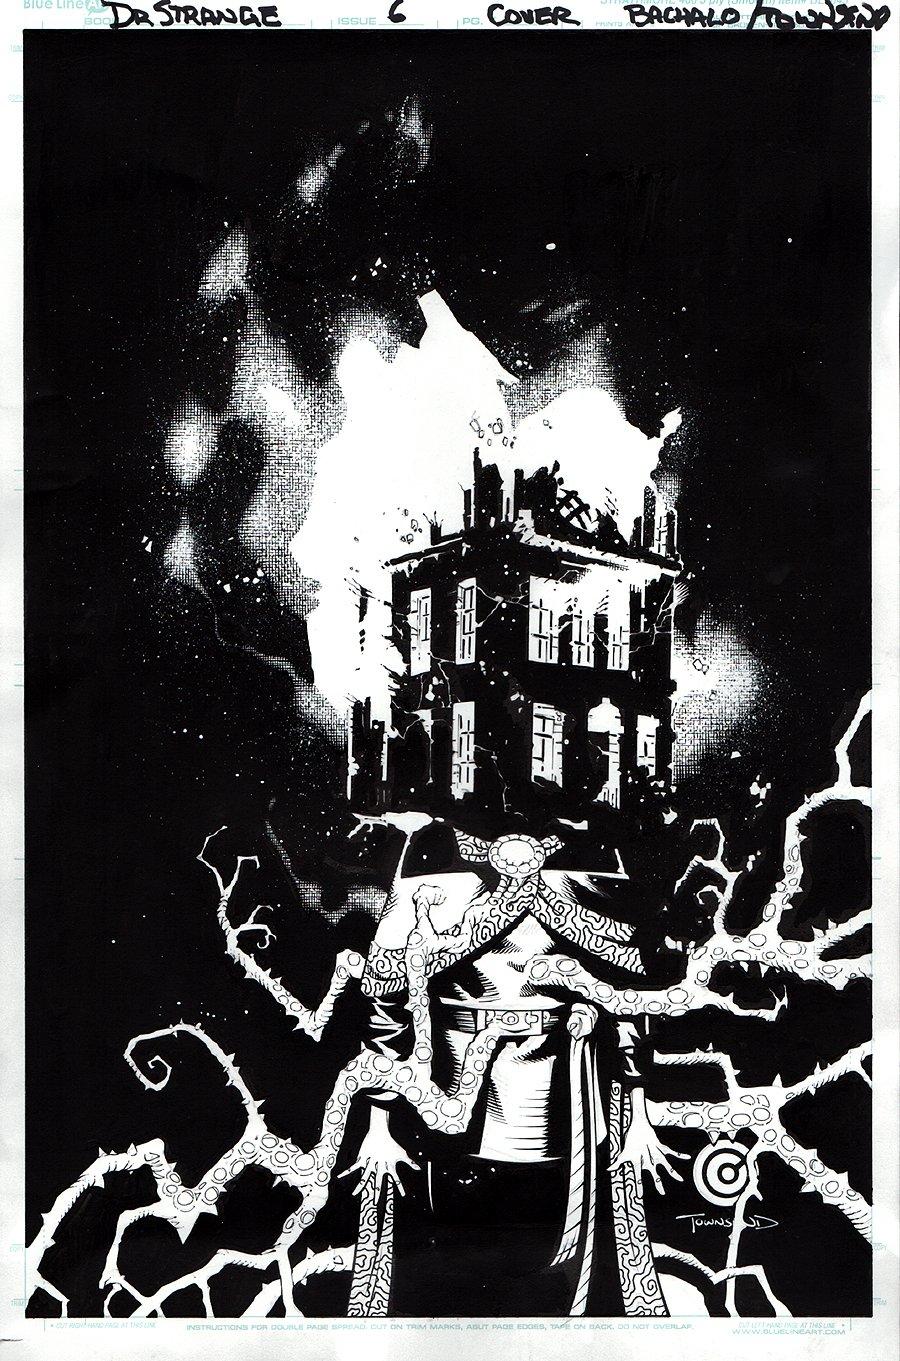 Doctor Strange #6 Cover (2015)